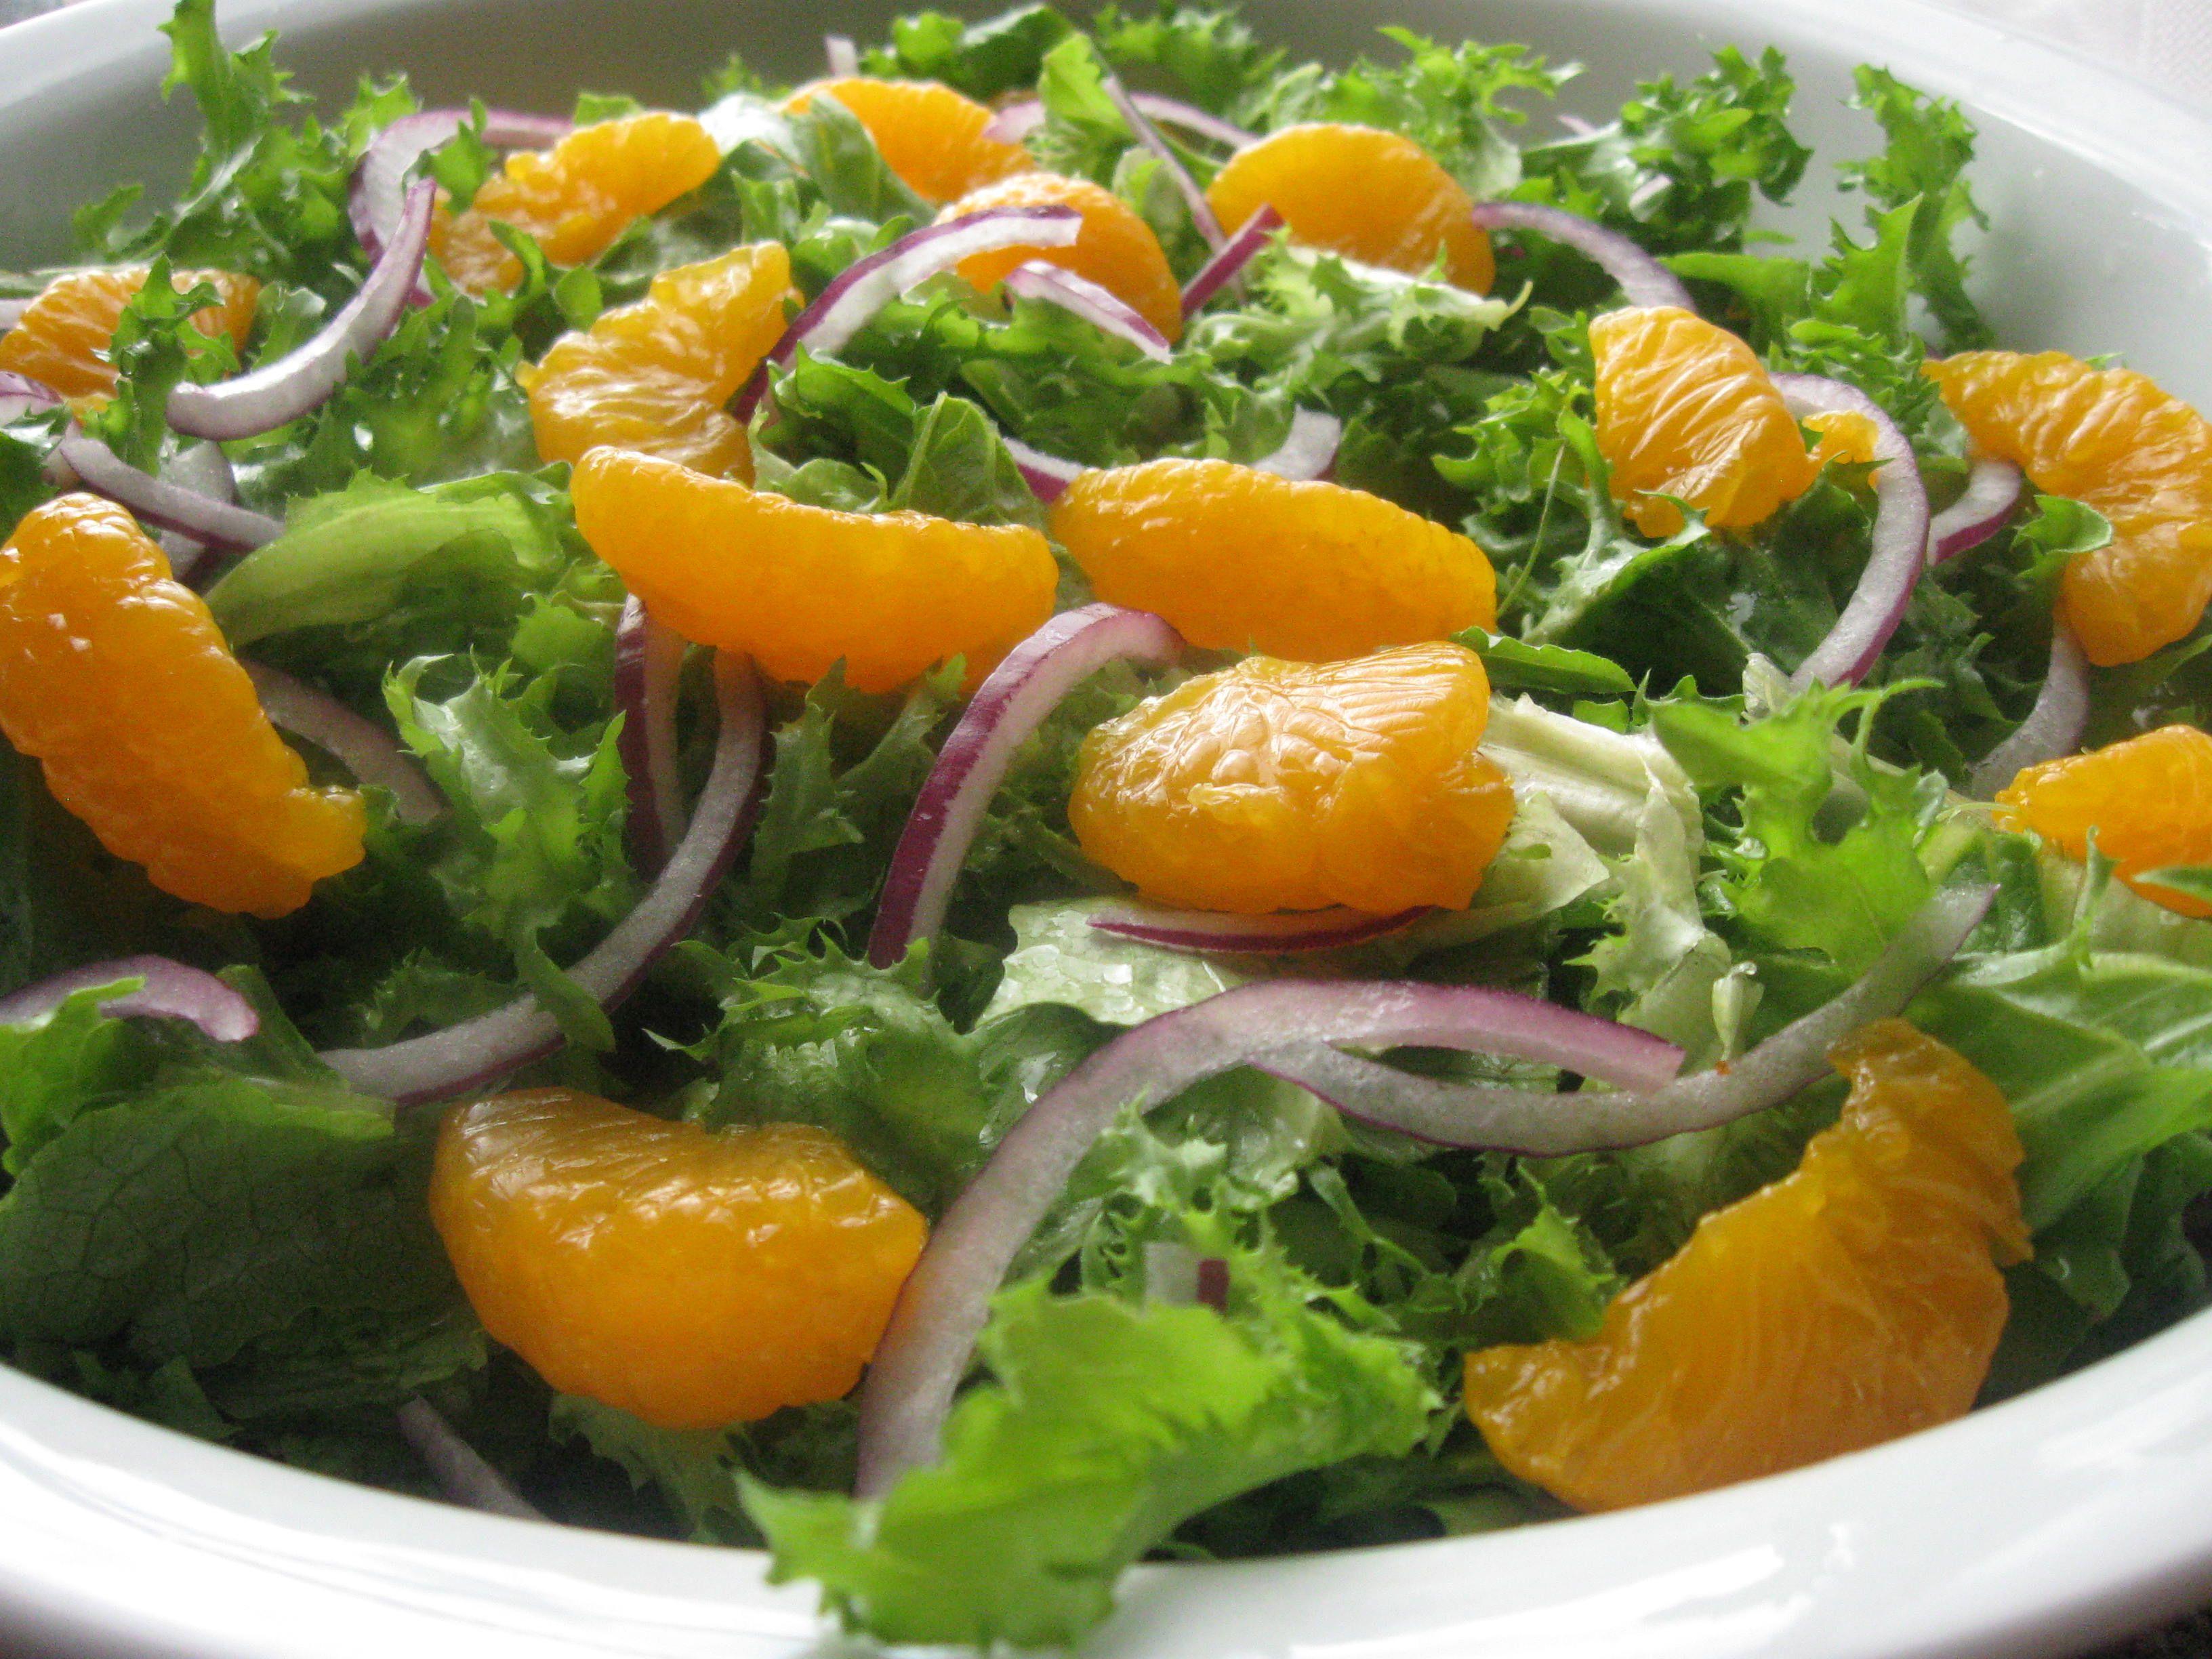 Dr. Rosenblat's Salad: 2 heads romaine lettuce, one red ...